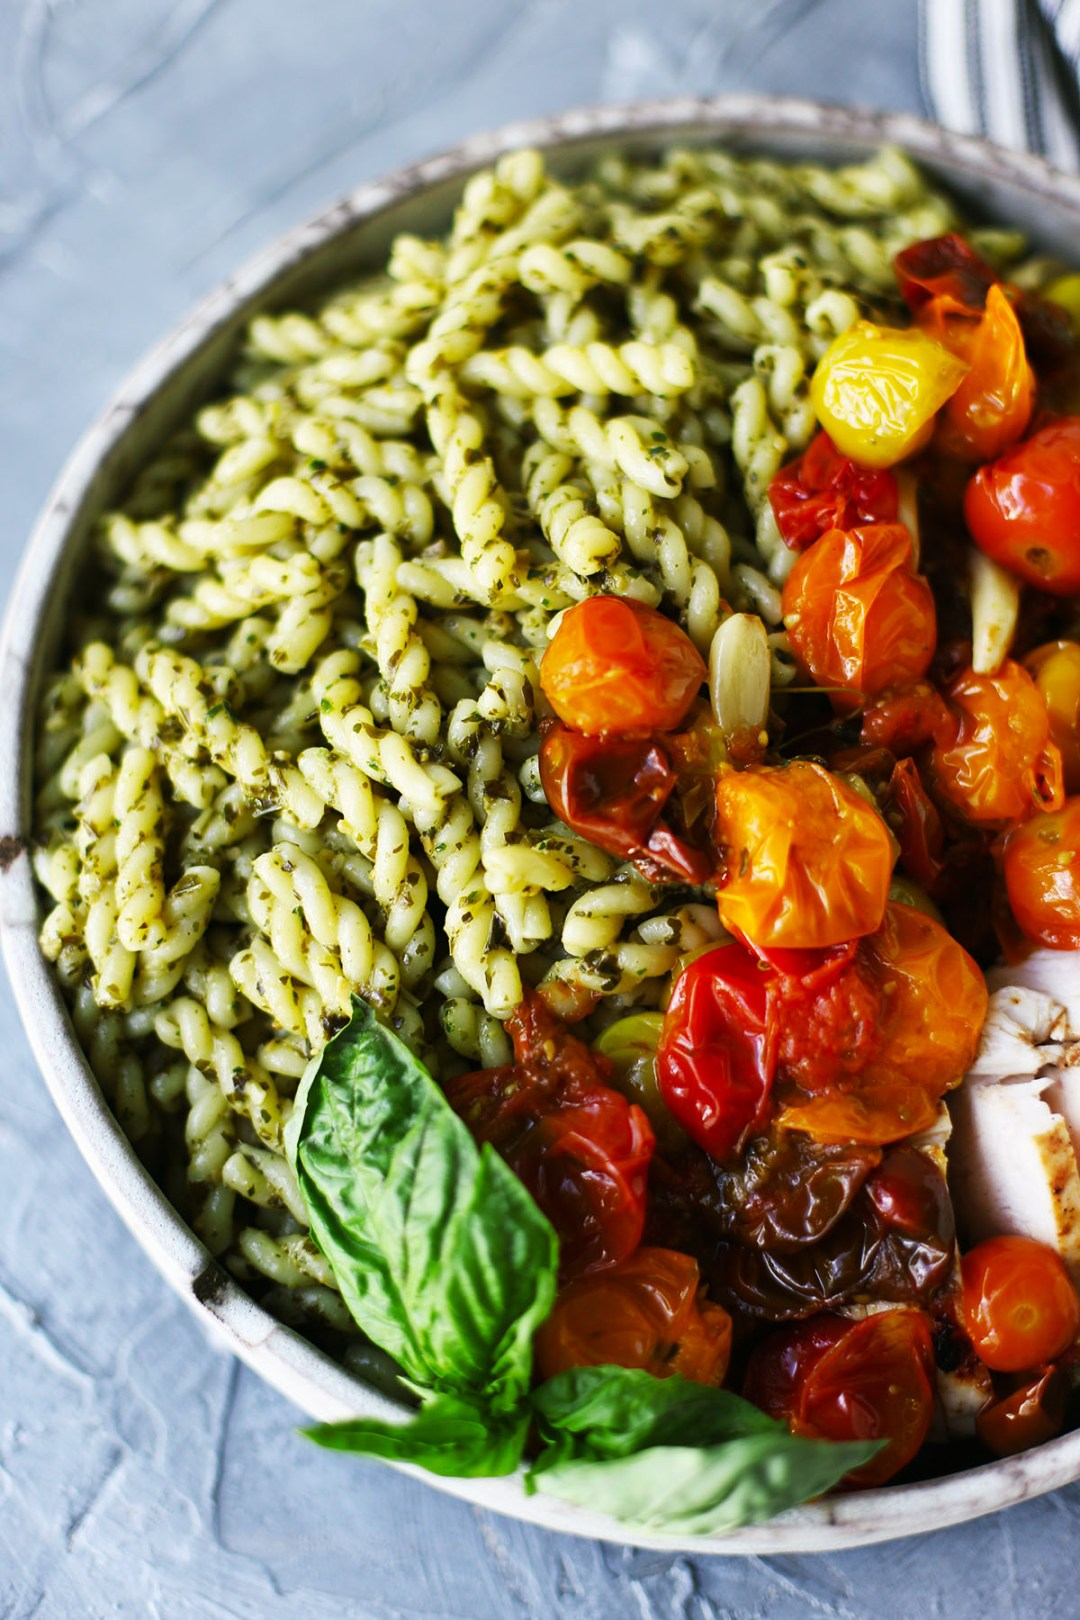 Pesto Pasta with Lemon Garlic Chicken and Cherry Tomato Confit